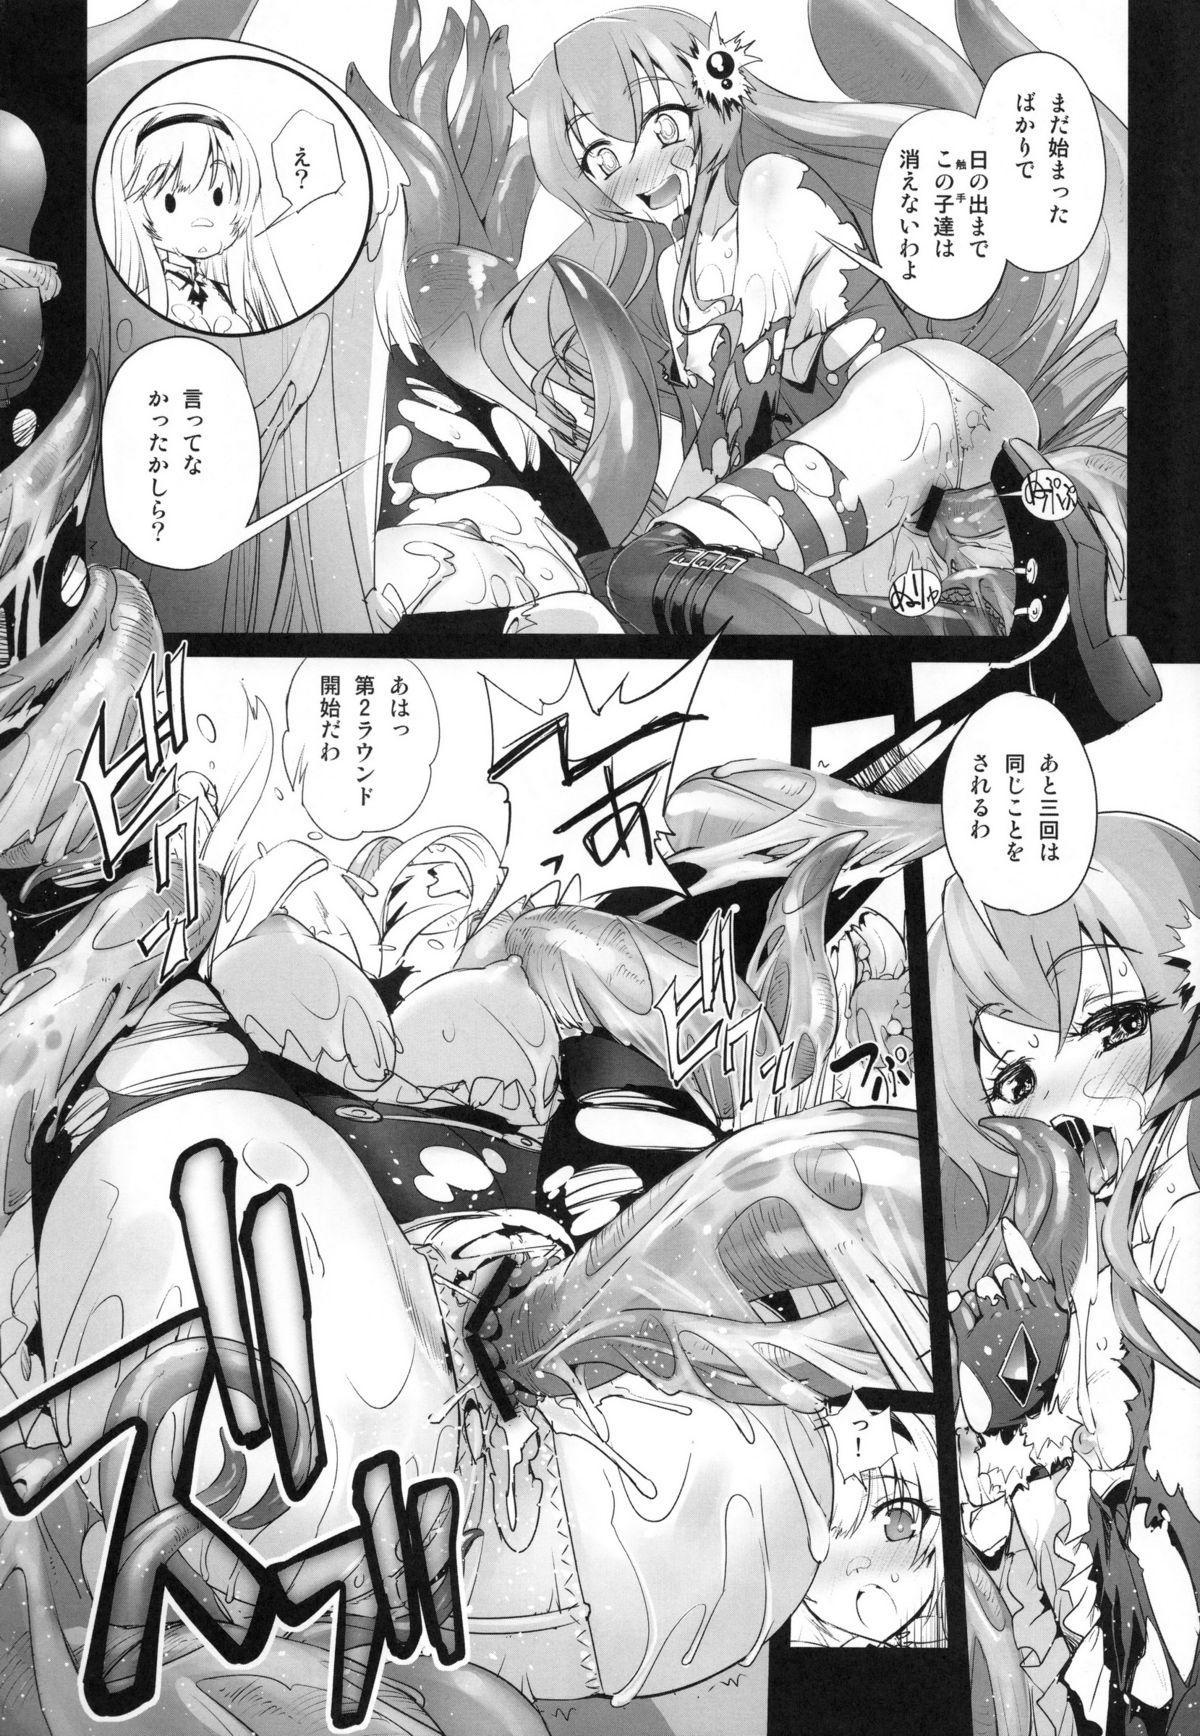 Anna to Majo no Shokushu Yuugi - Tentacle of Anna and Witch 30